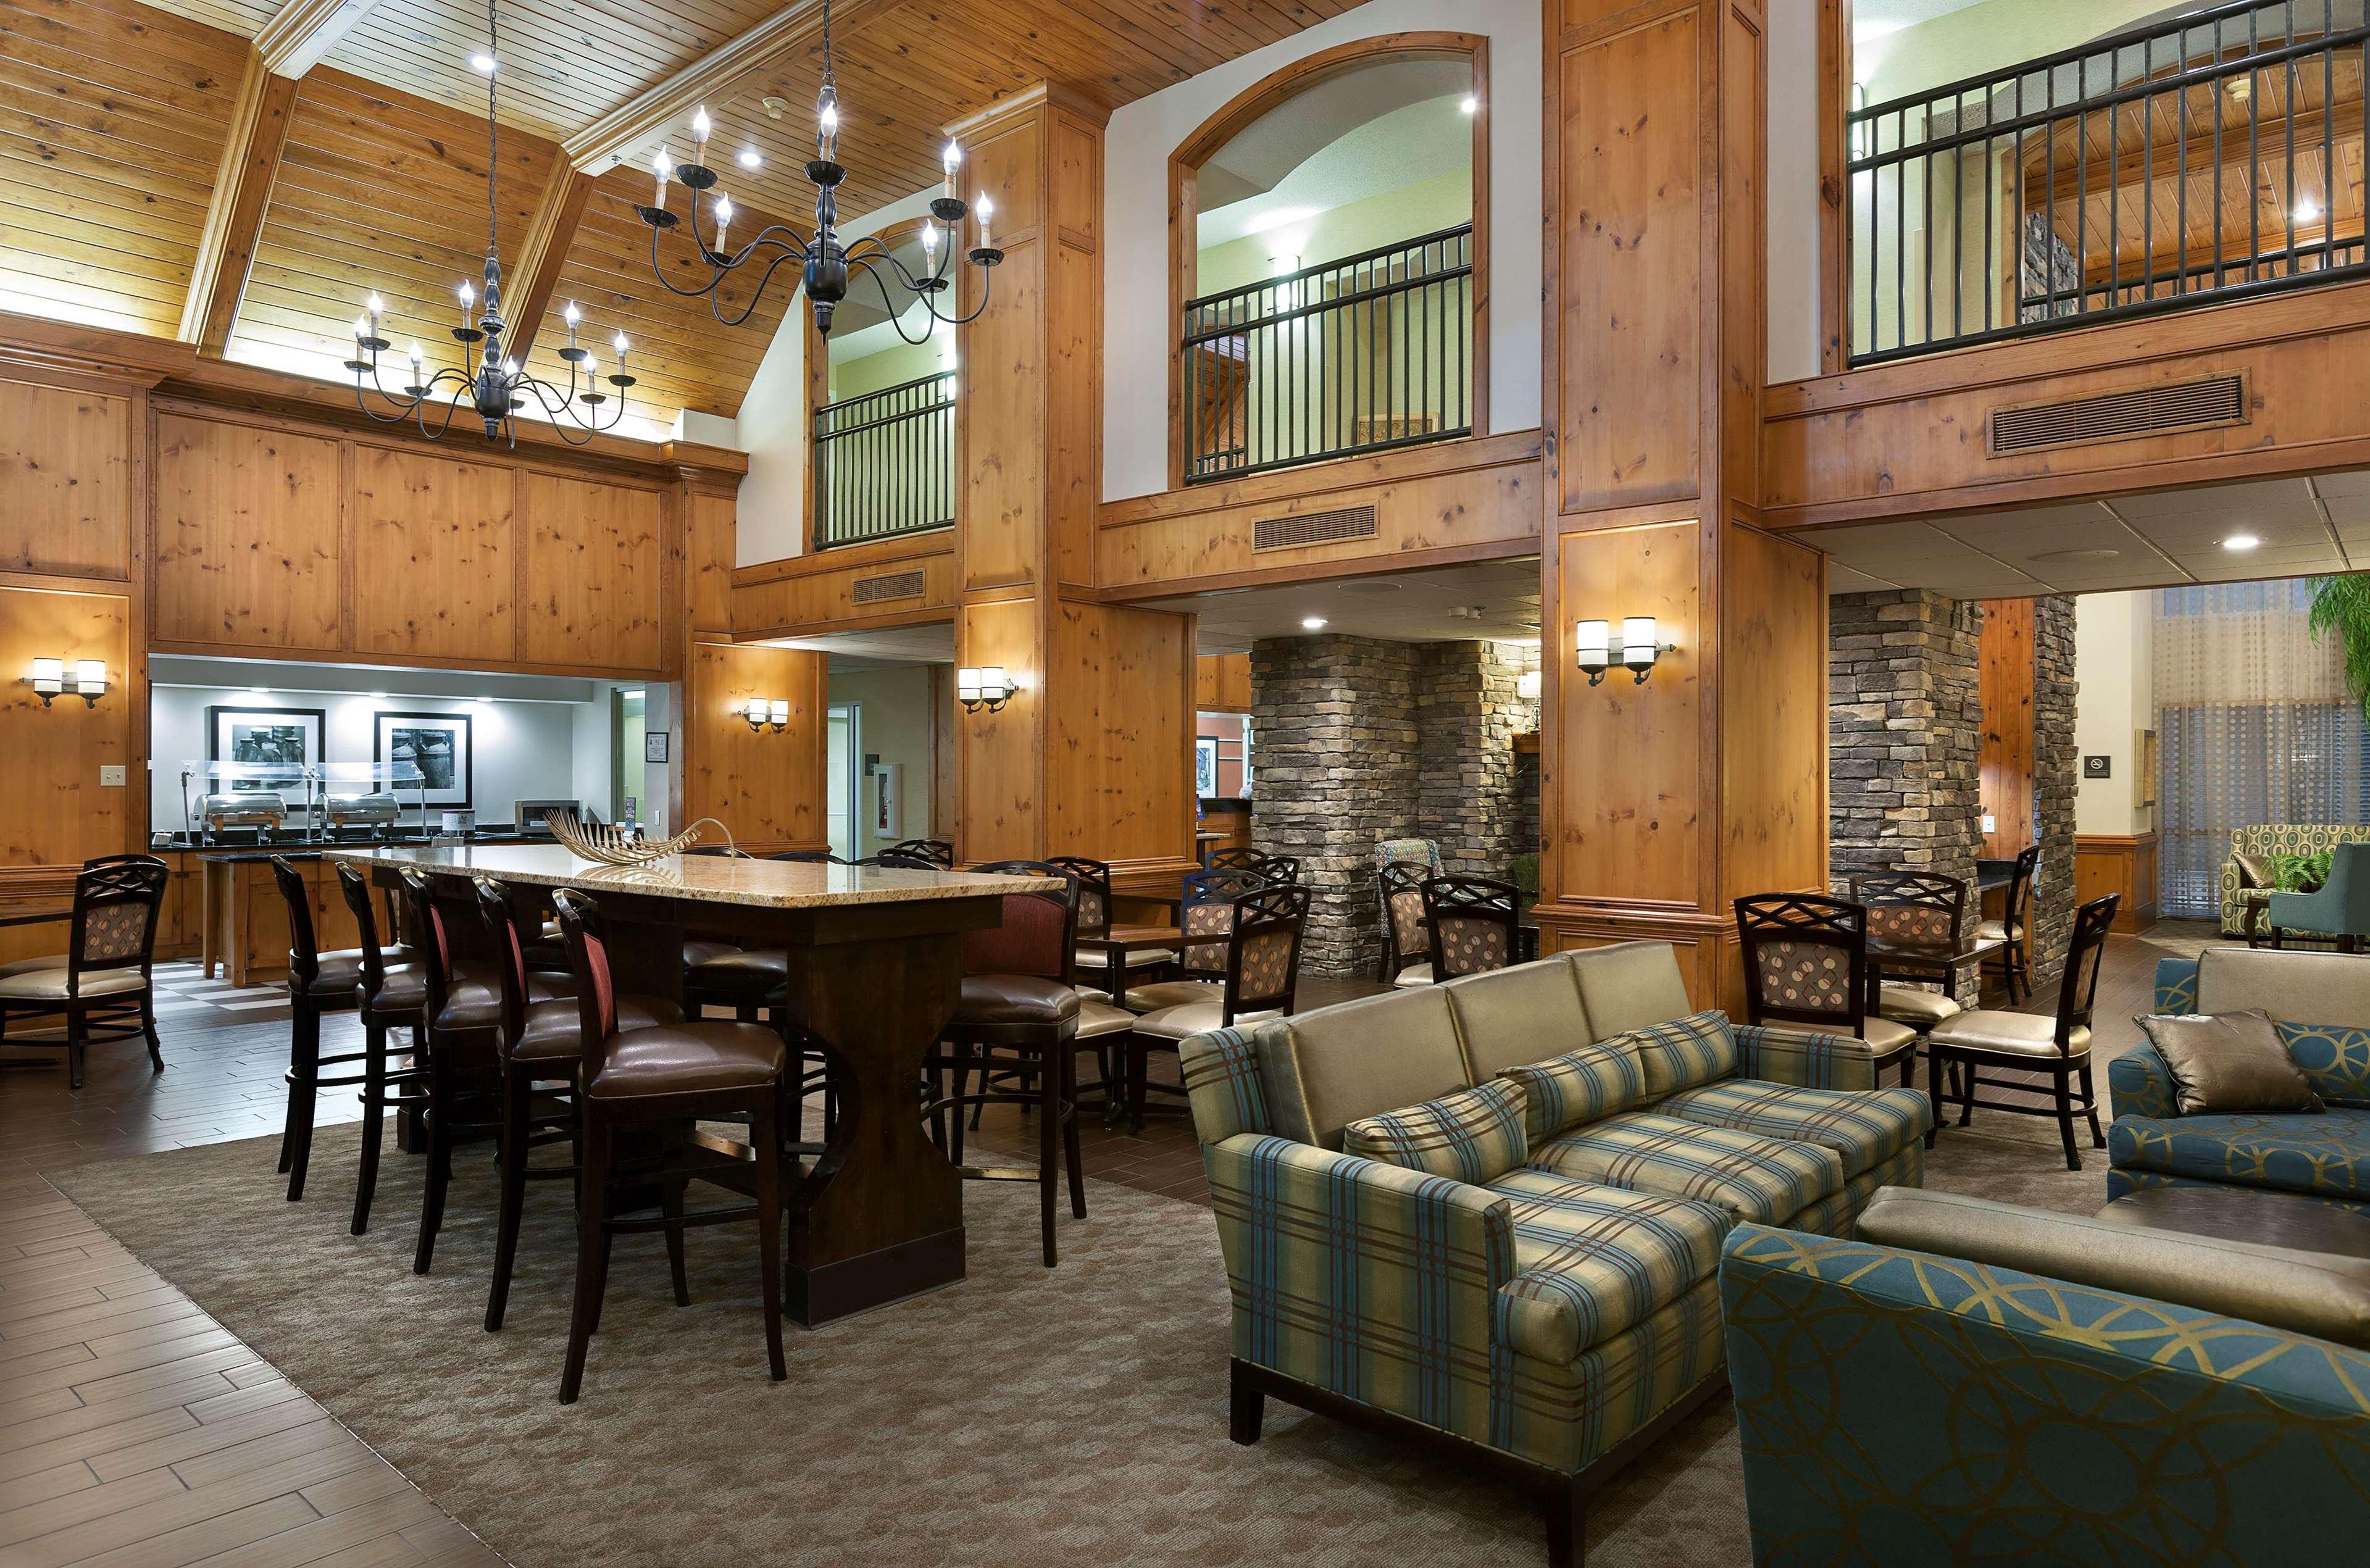 Hampton Inn & Suites Charlotte/Pineville image 29